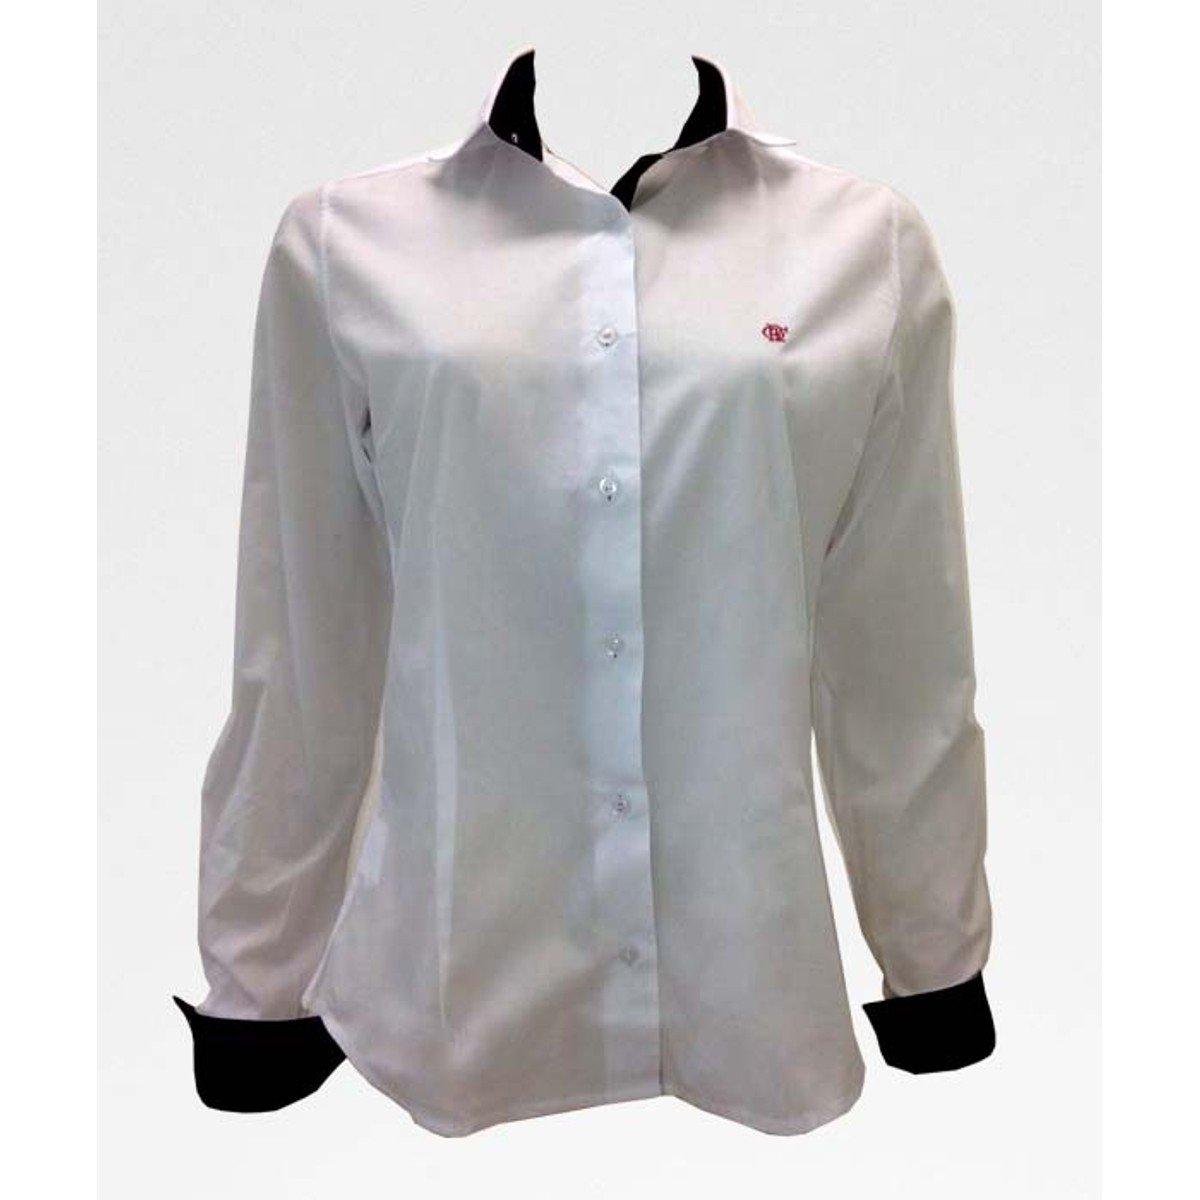 09bce956fad27 Camisa Social Palla D Oro do Flamengo M L - Compre Agora